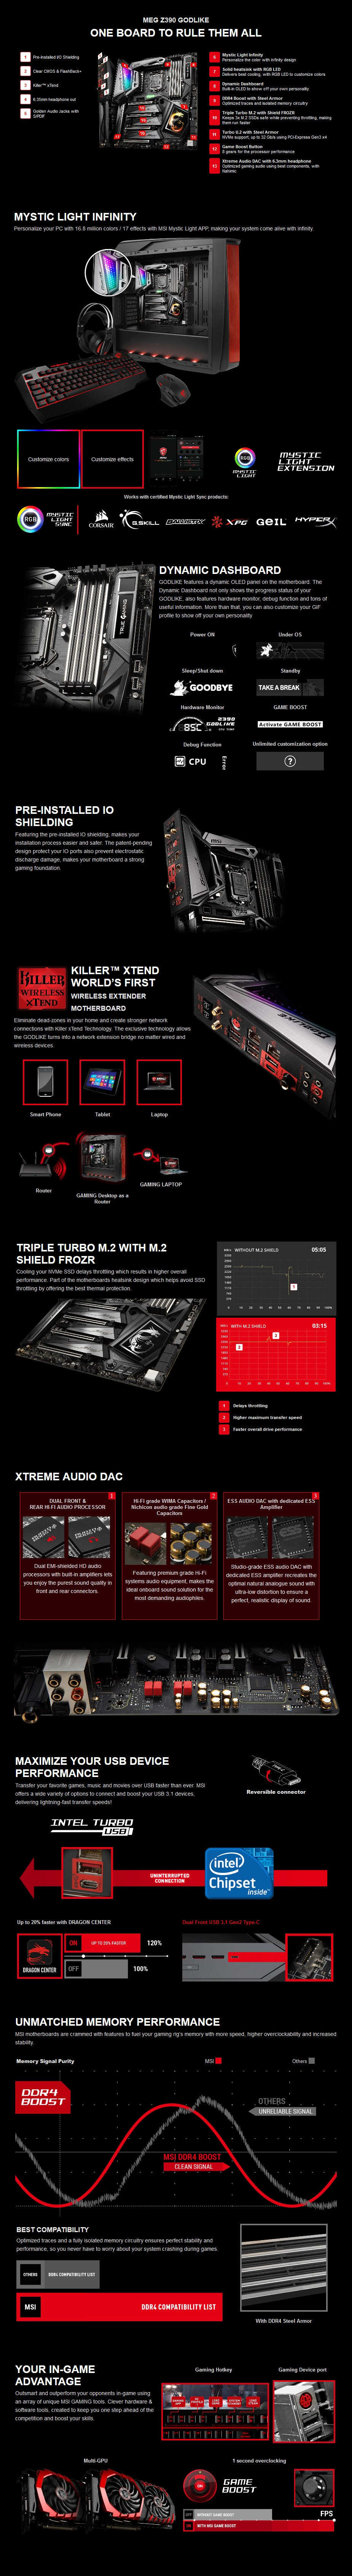 MSI MEG Z390 GODLIKE LGA 1151 E-ATX Motherboard - Desktop Overview 1